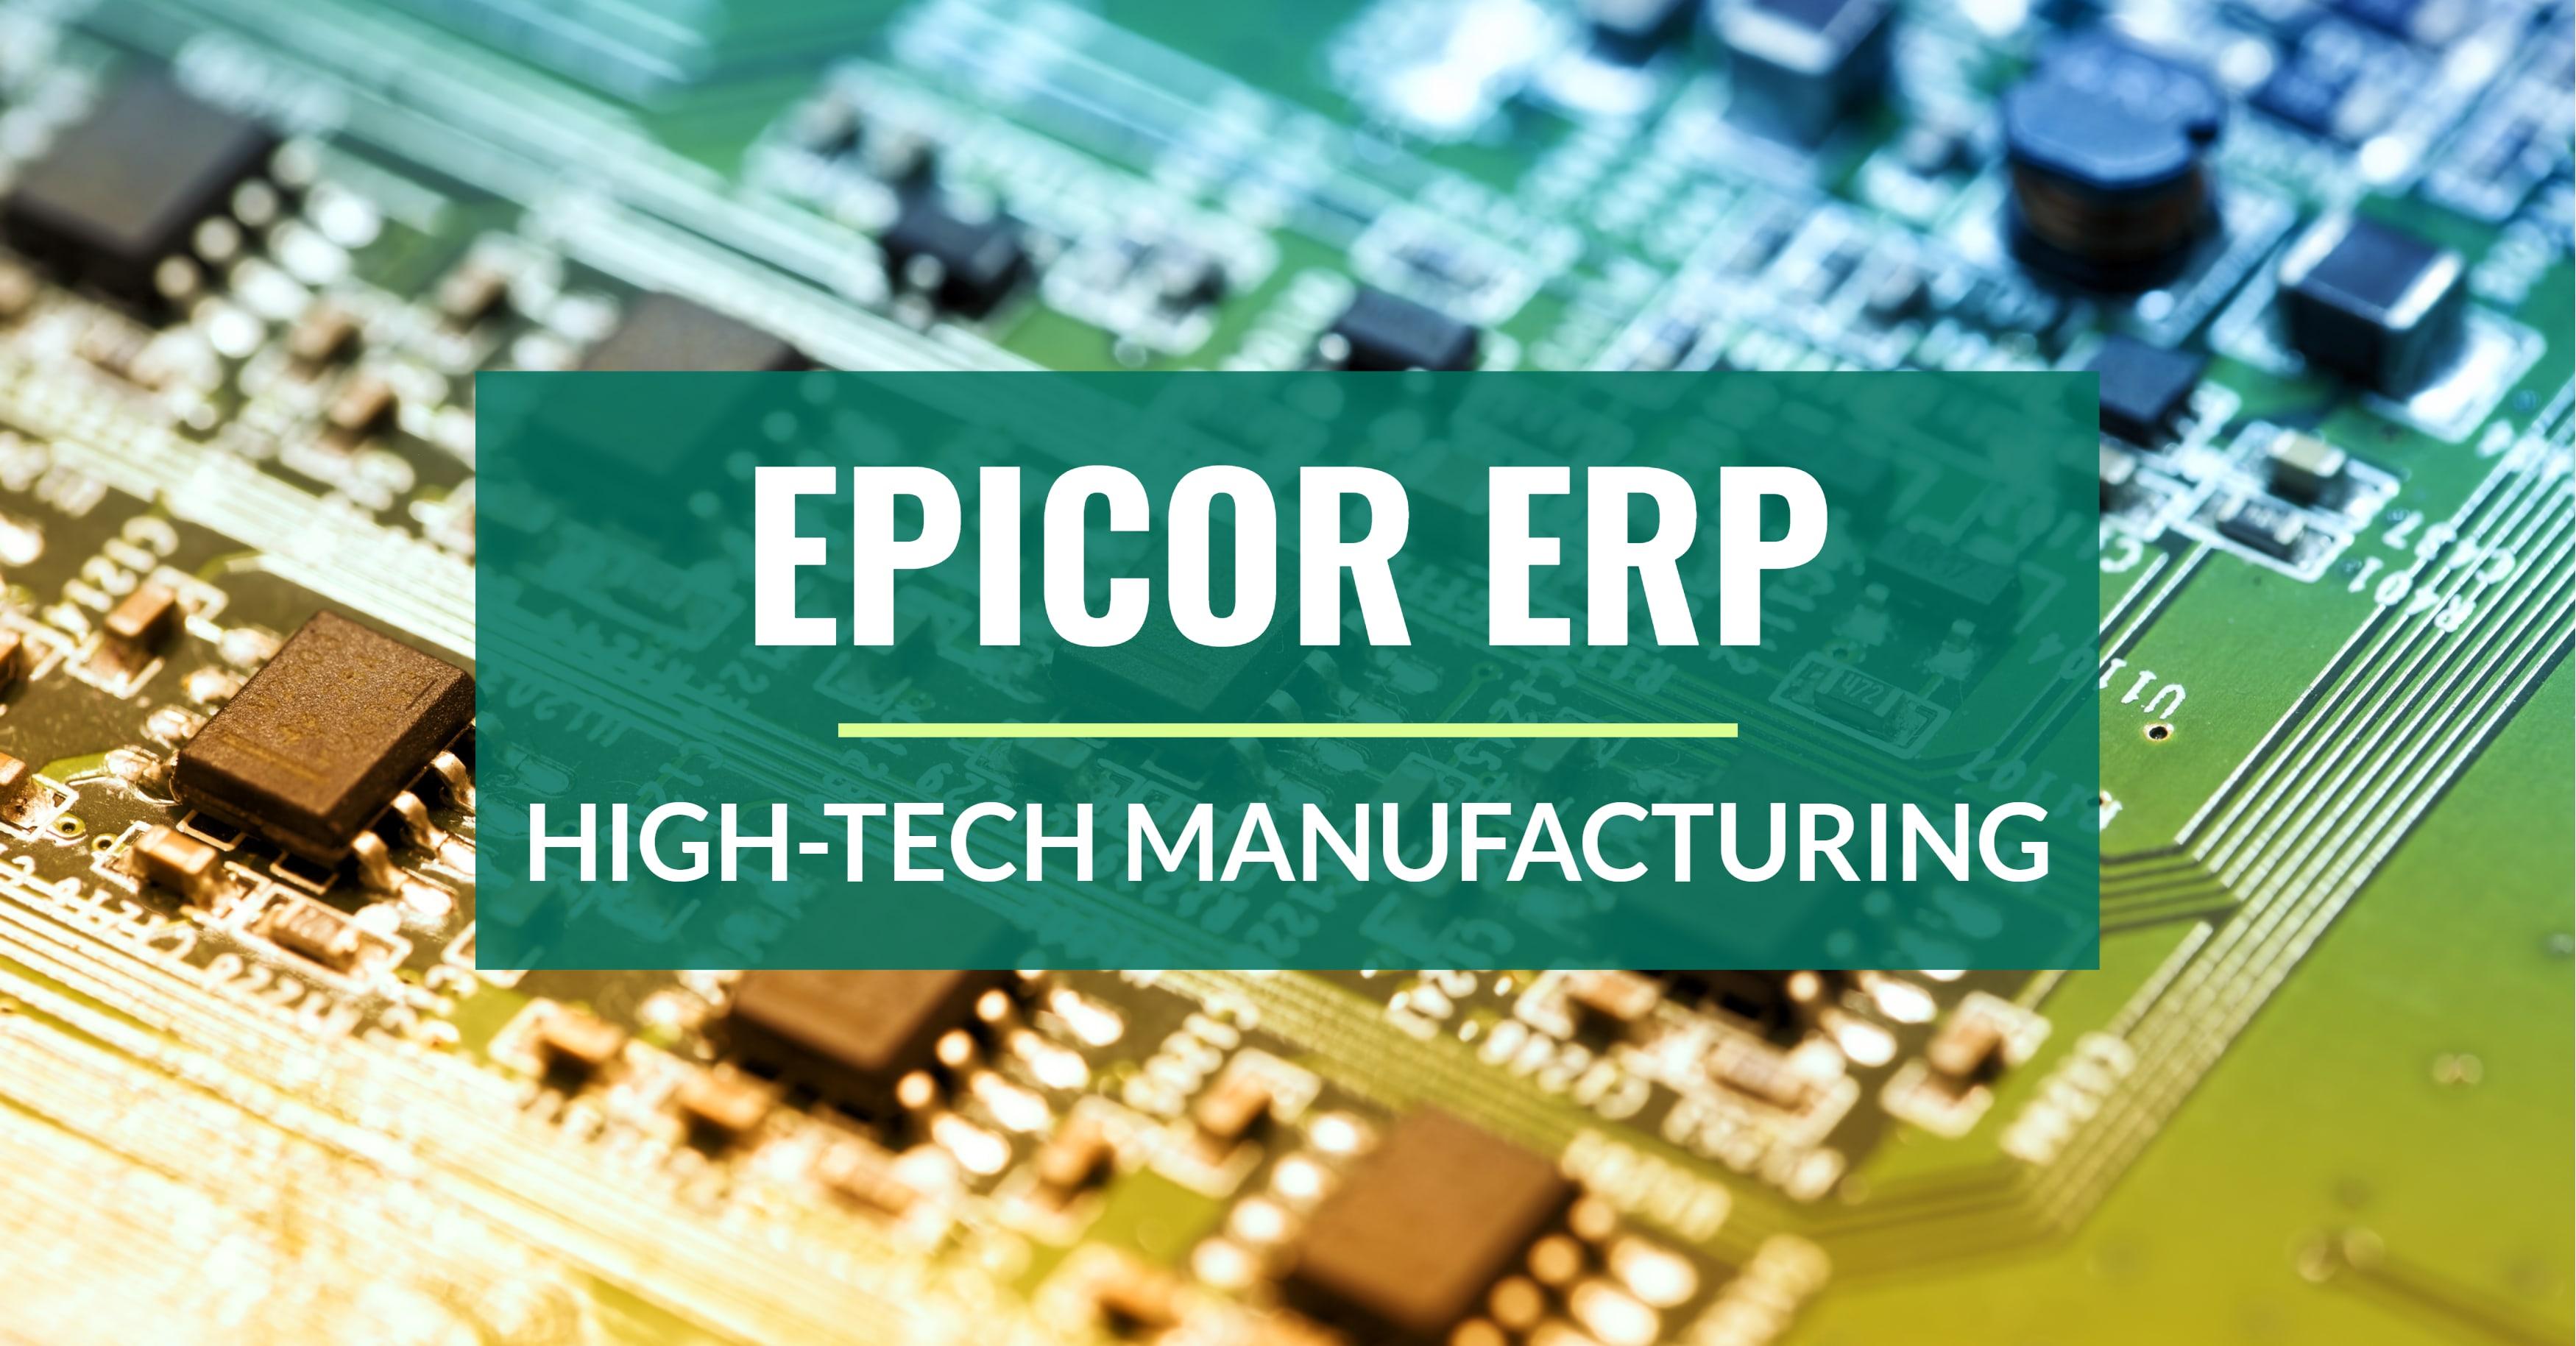 Epicor ERP High-Tech Manufacturing